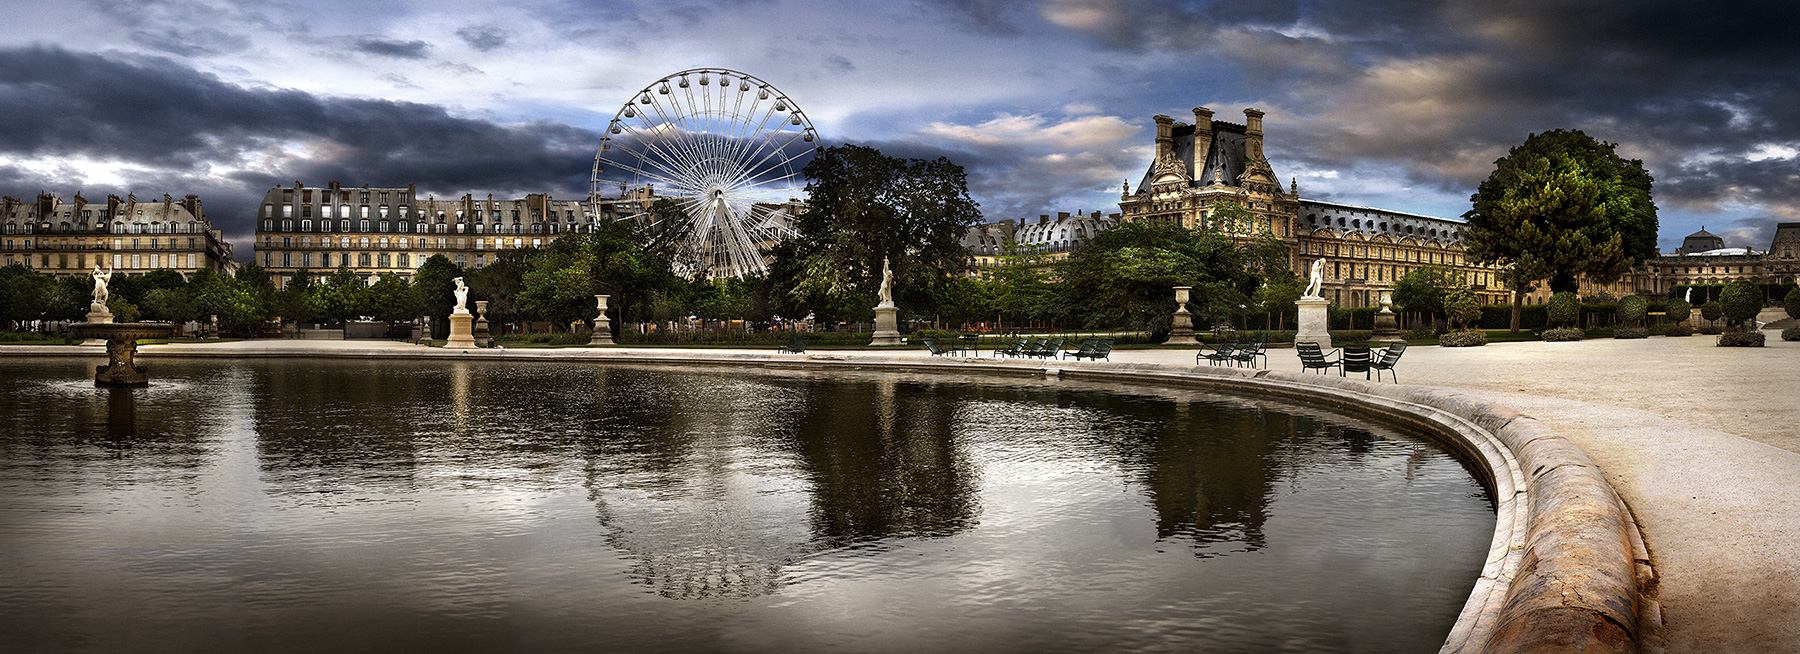 Le Jardin Des Tuileries Panoramic Art Photo Stephane Rey Gorrez